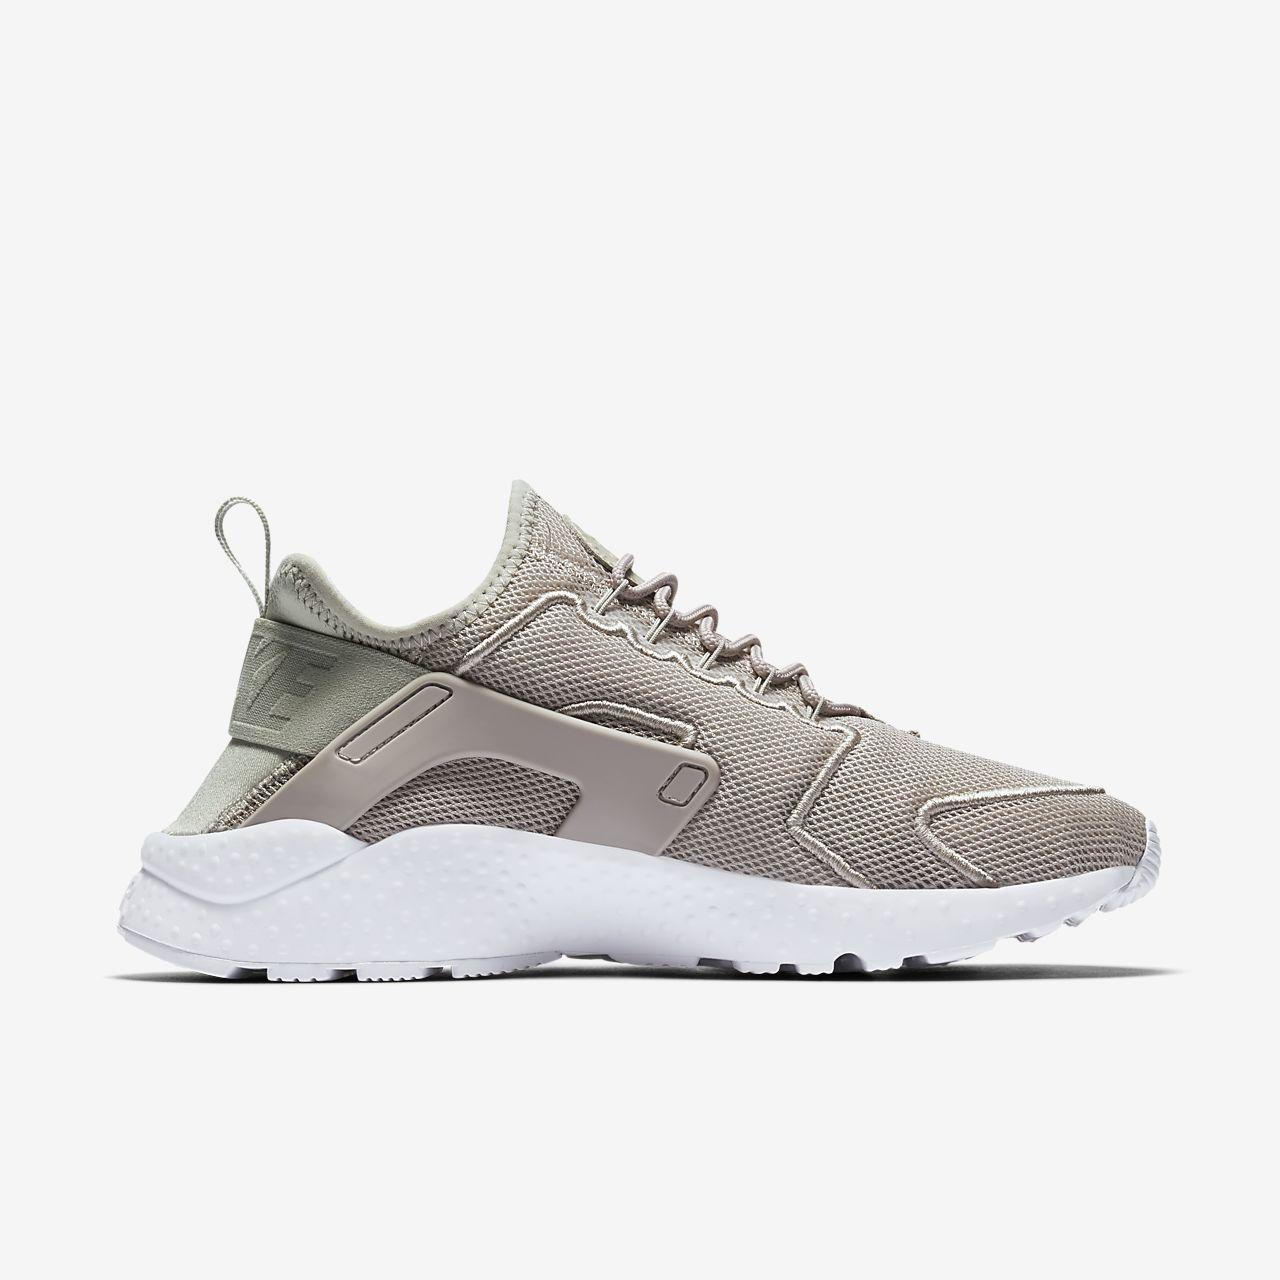 ... Nike Air Huarache Ultra Breathe Women's Shoe